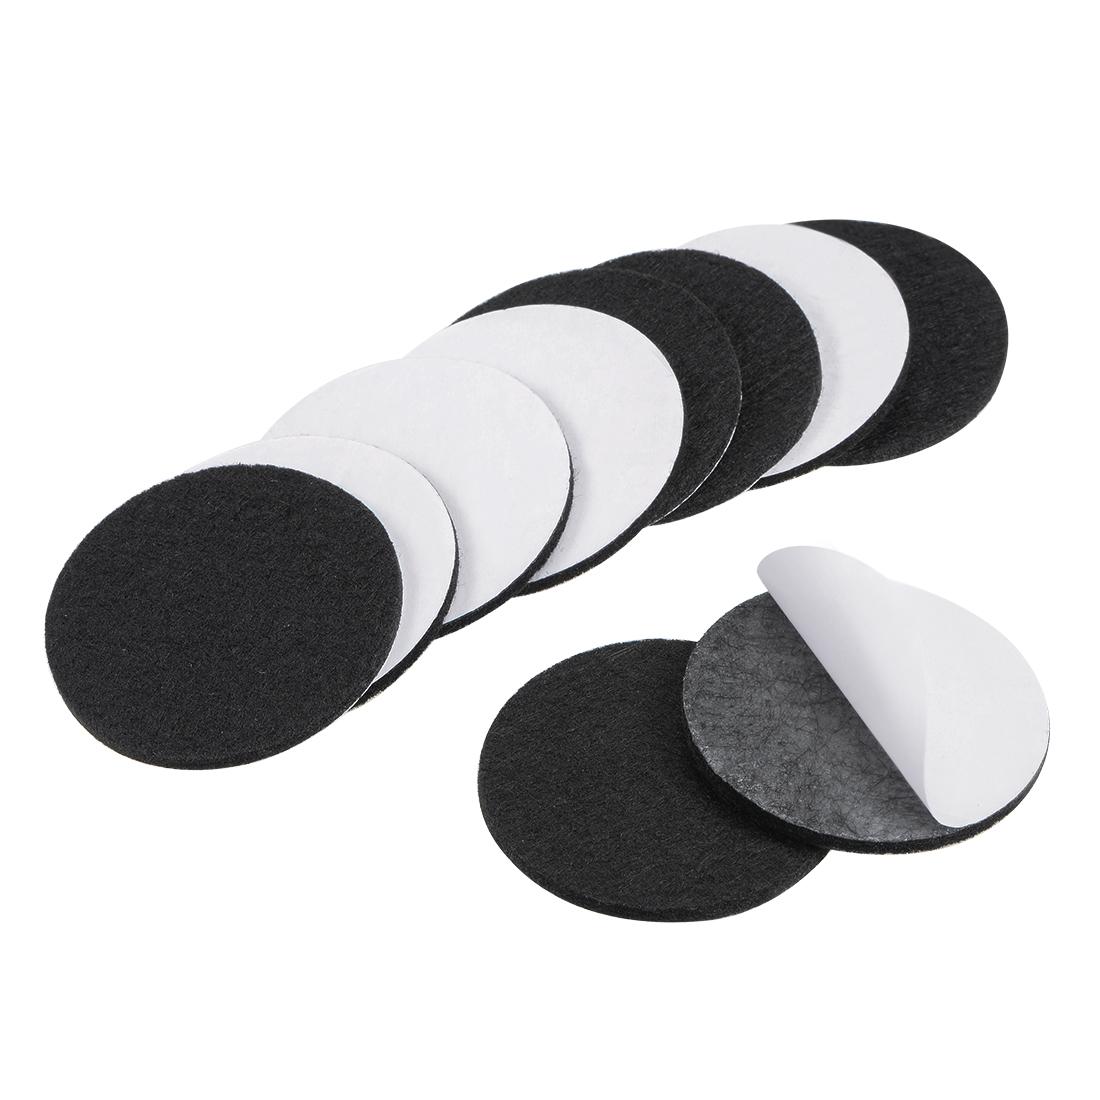 Furniture Pads Adhesive Felt Pads 50mm Diameter 3mm Thick Round Black 10Pcs